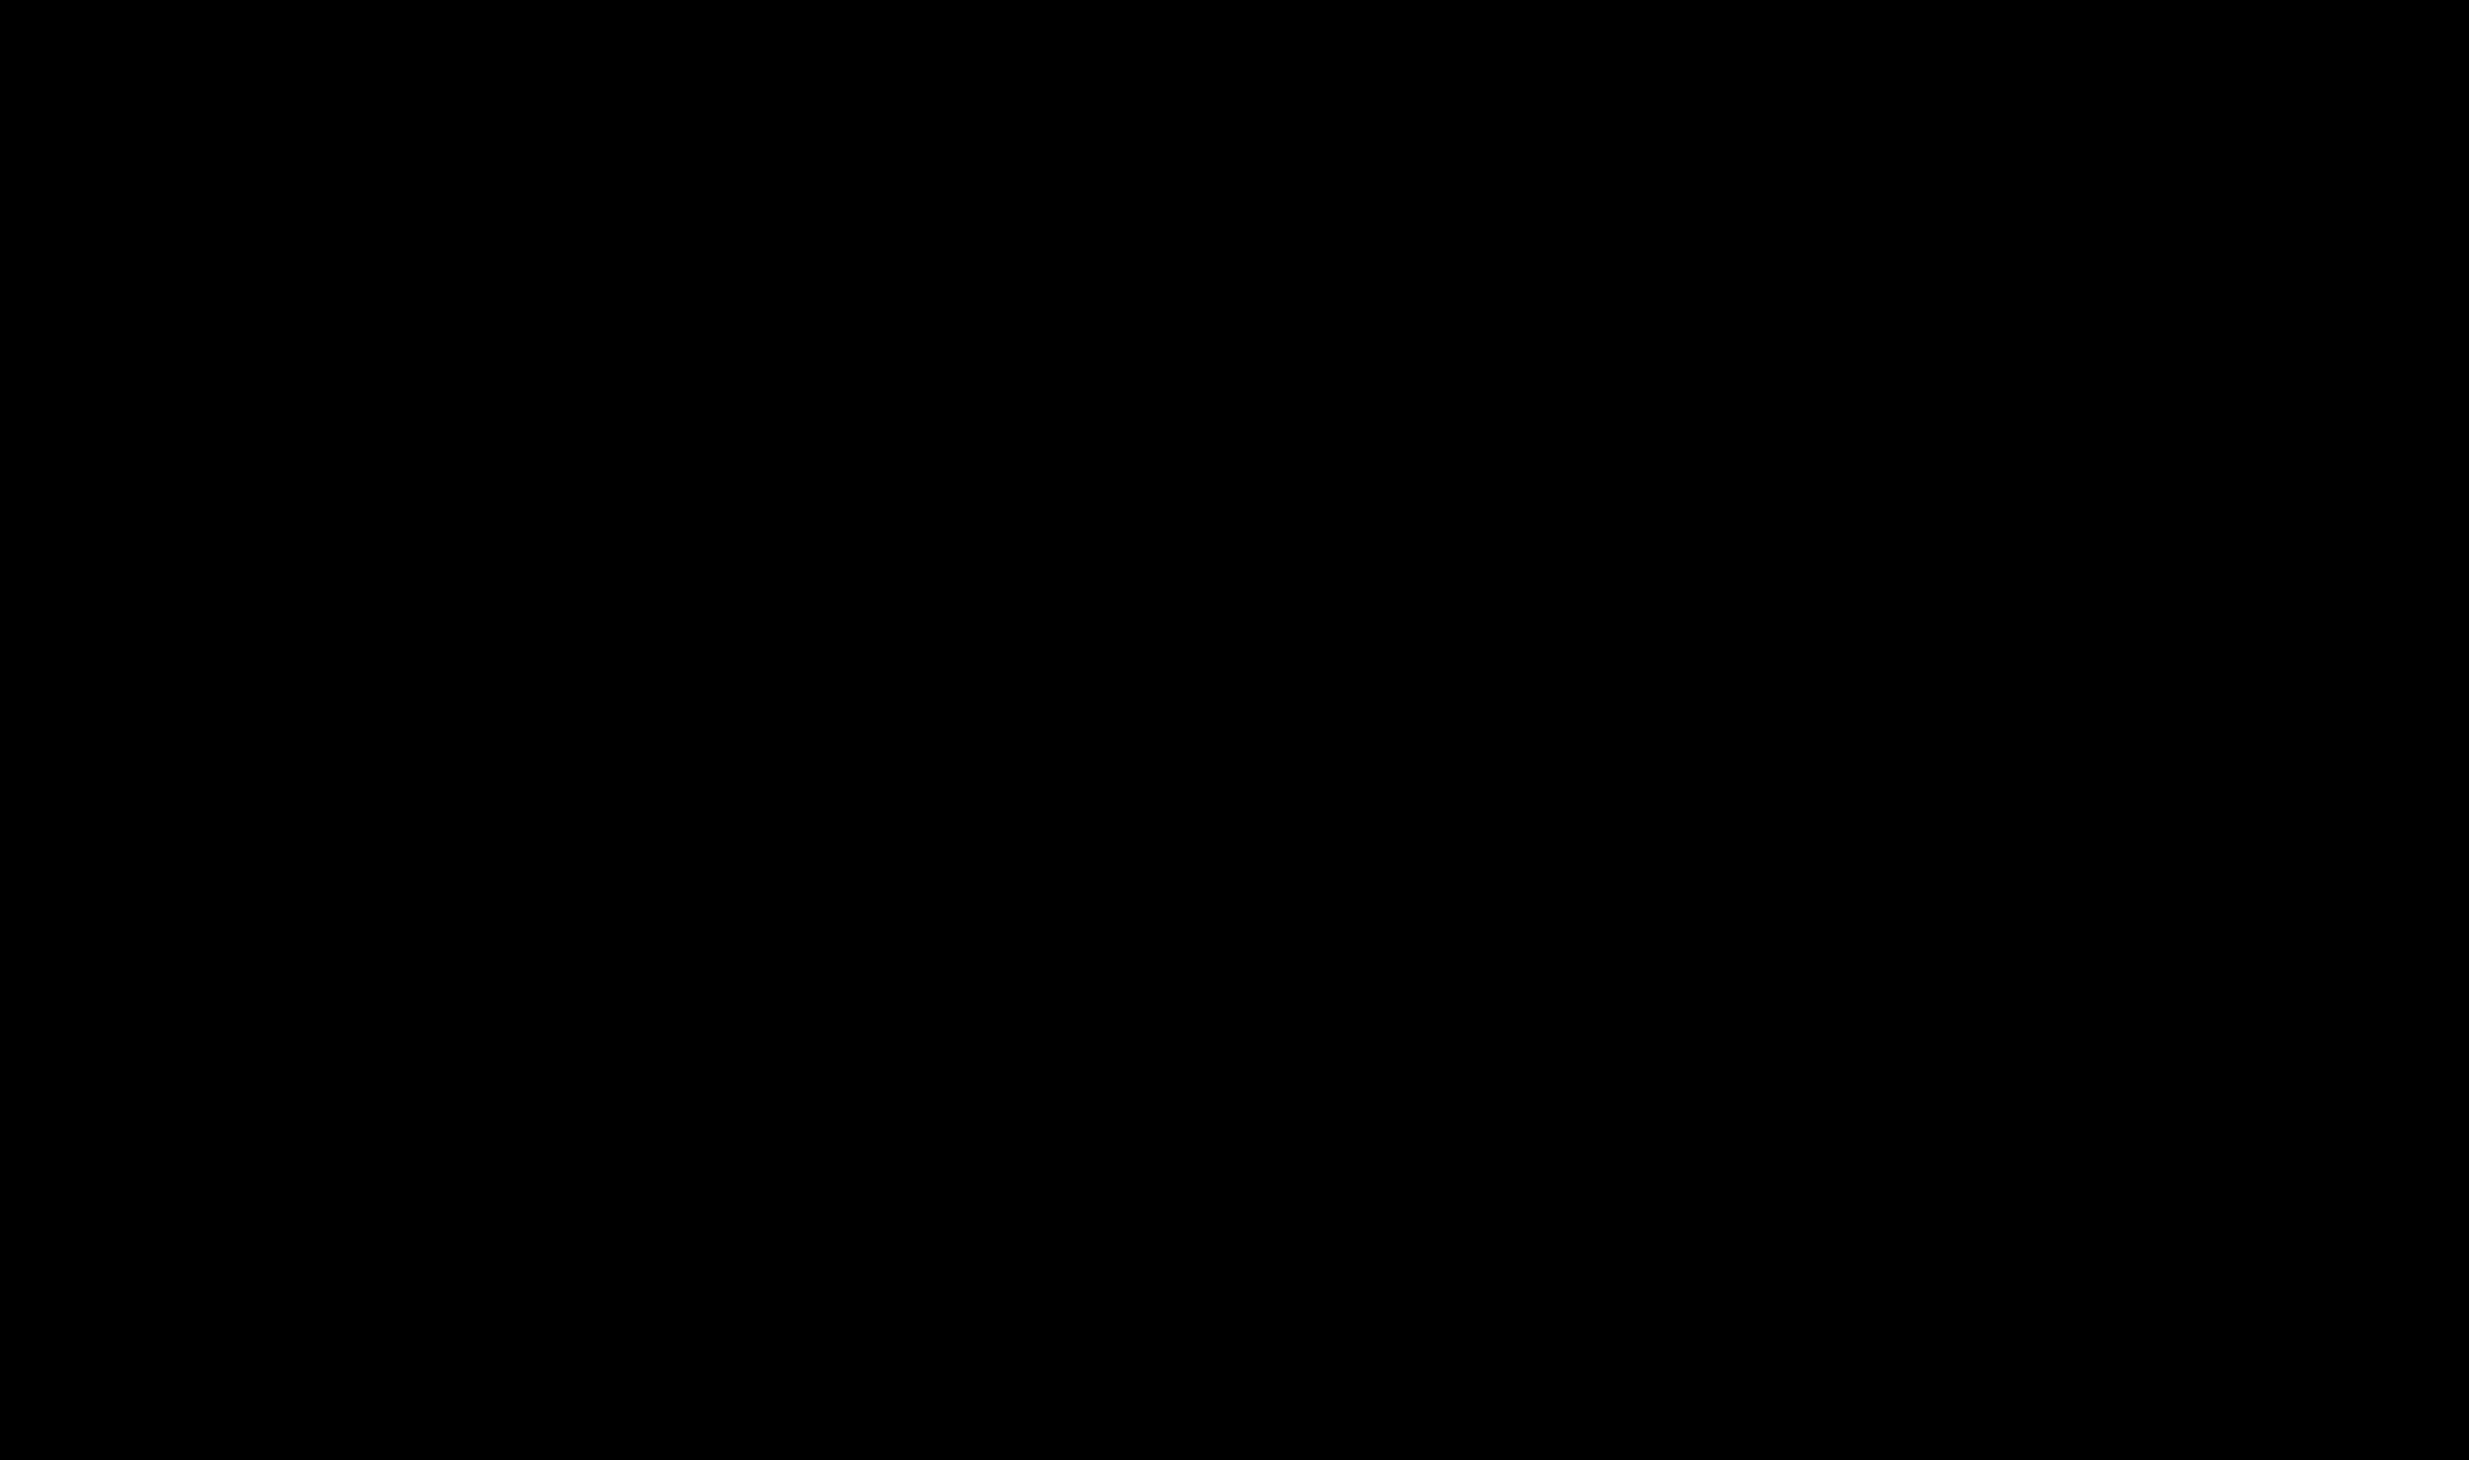 Hexa(-amido-dPEG®₁₁-MAL)dipentaerythritol